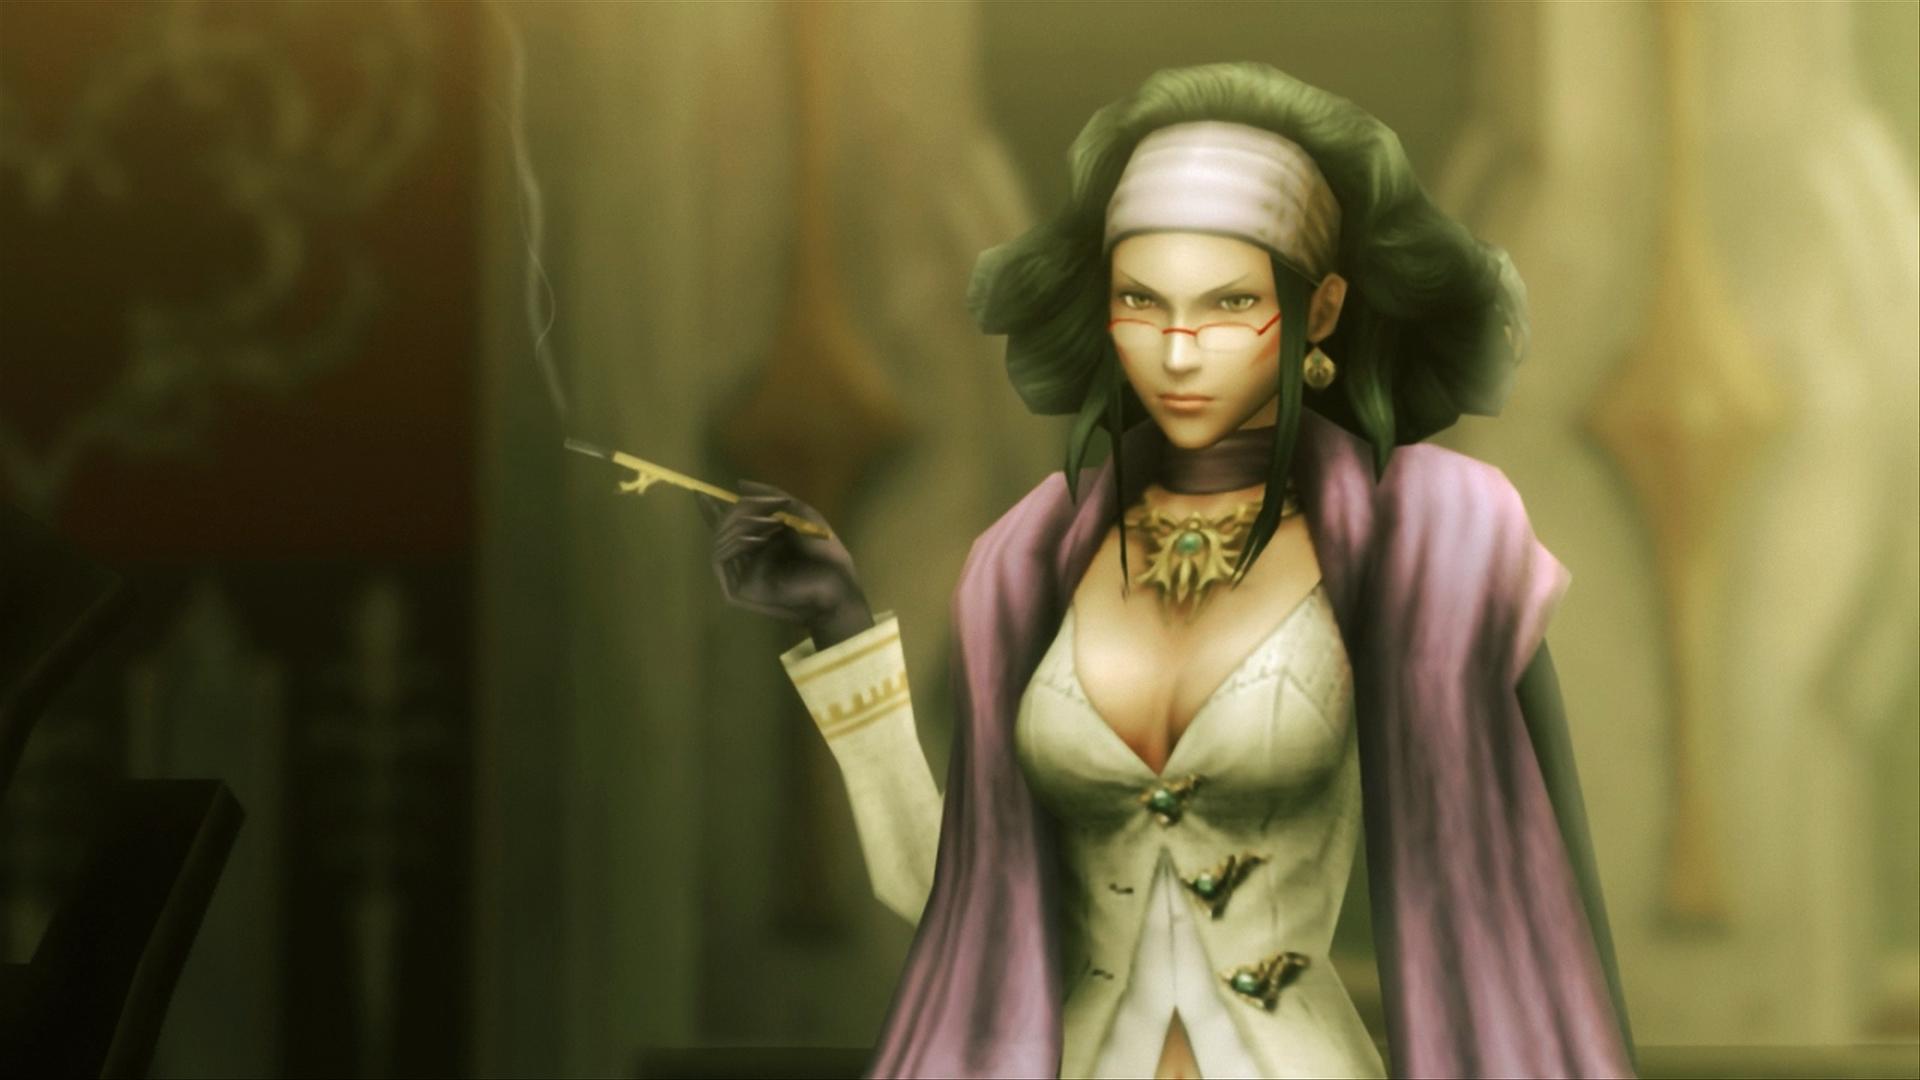 Skyrim Girl Wallpaper New Final Fantasy Type 0 Hd Screenshots Rpg Site